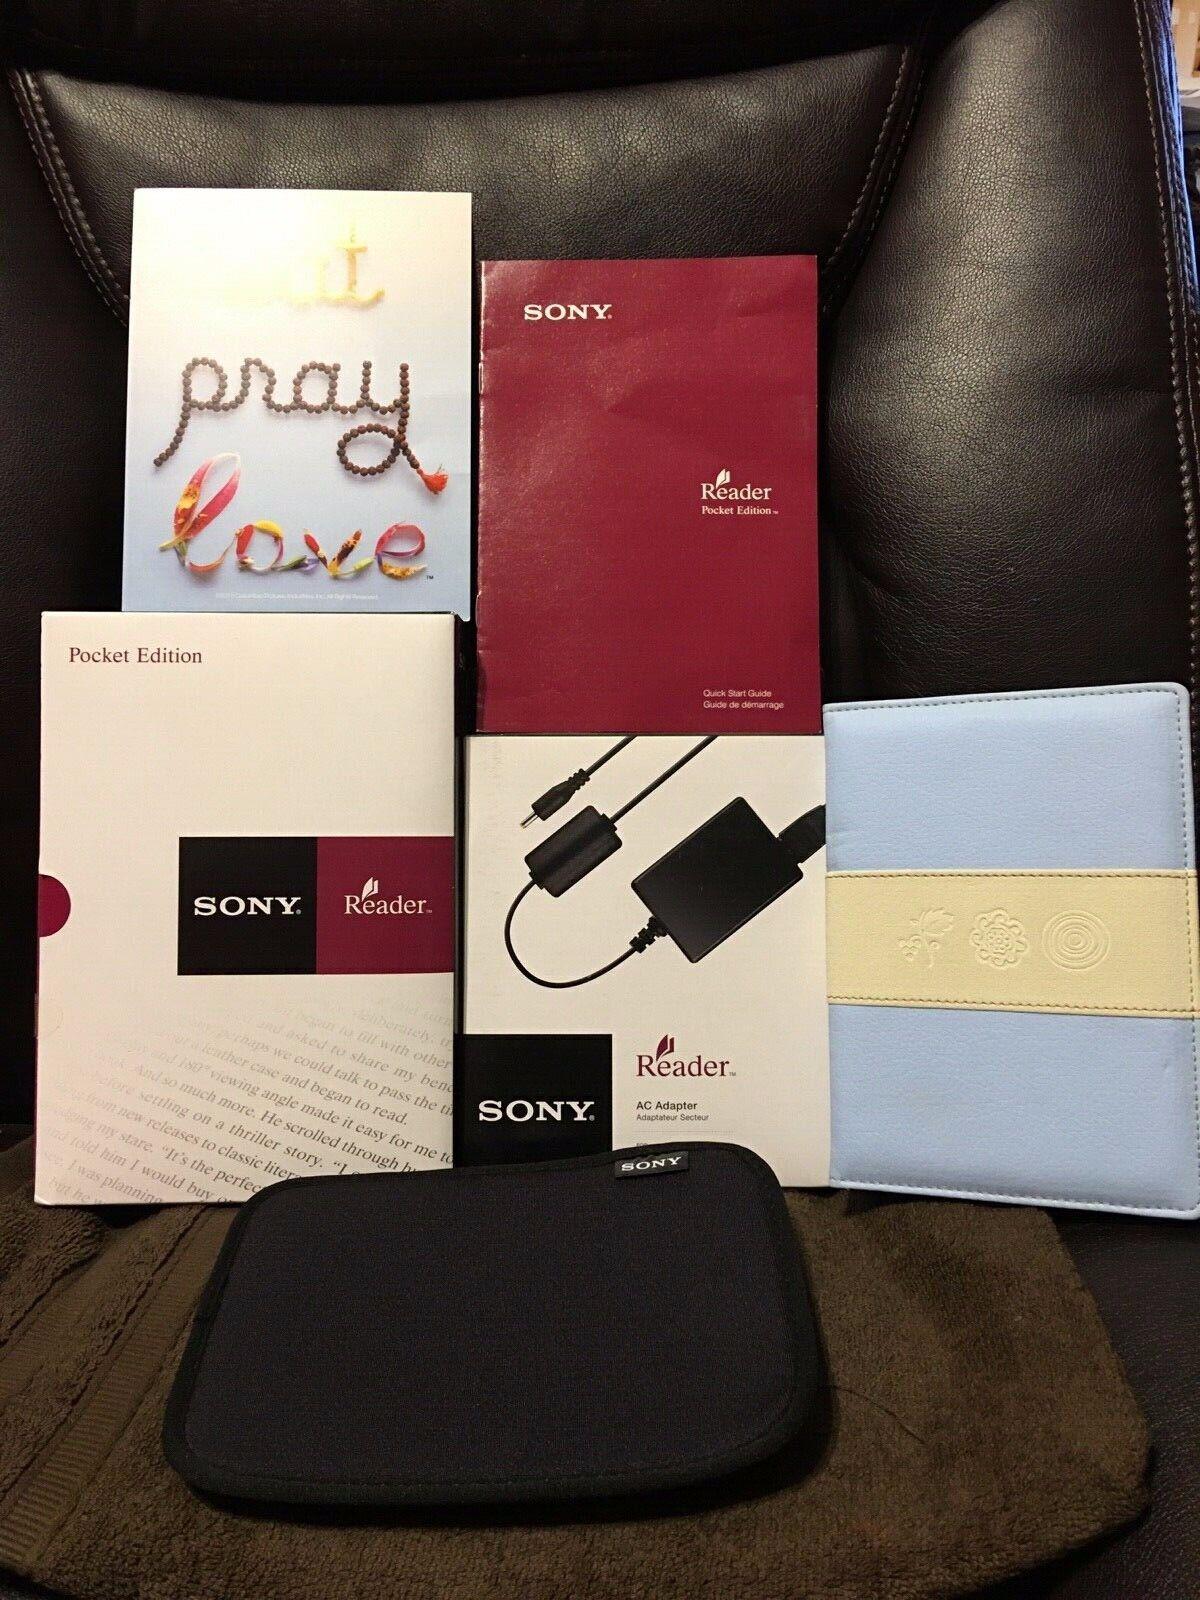 Sony Pocket Edition Eat Pray Love eReader-NEW!